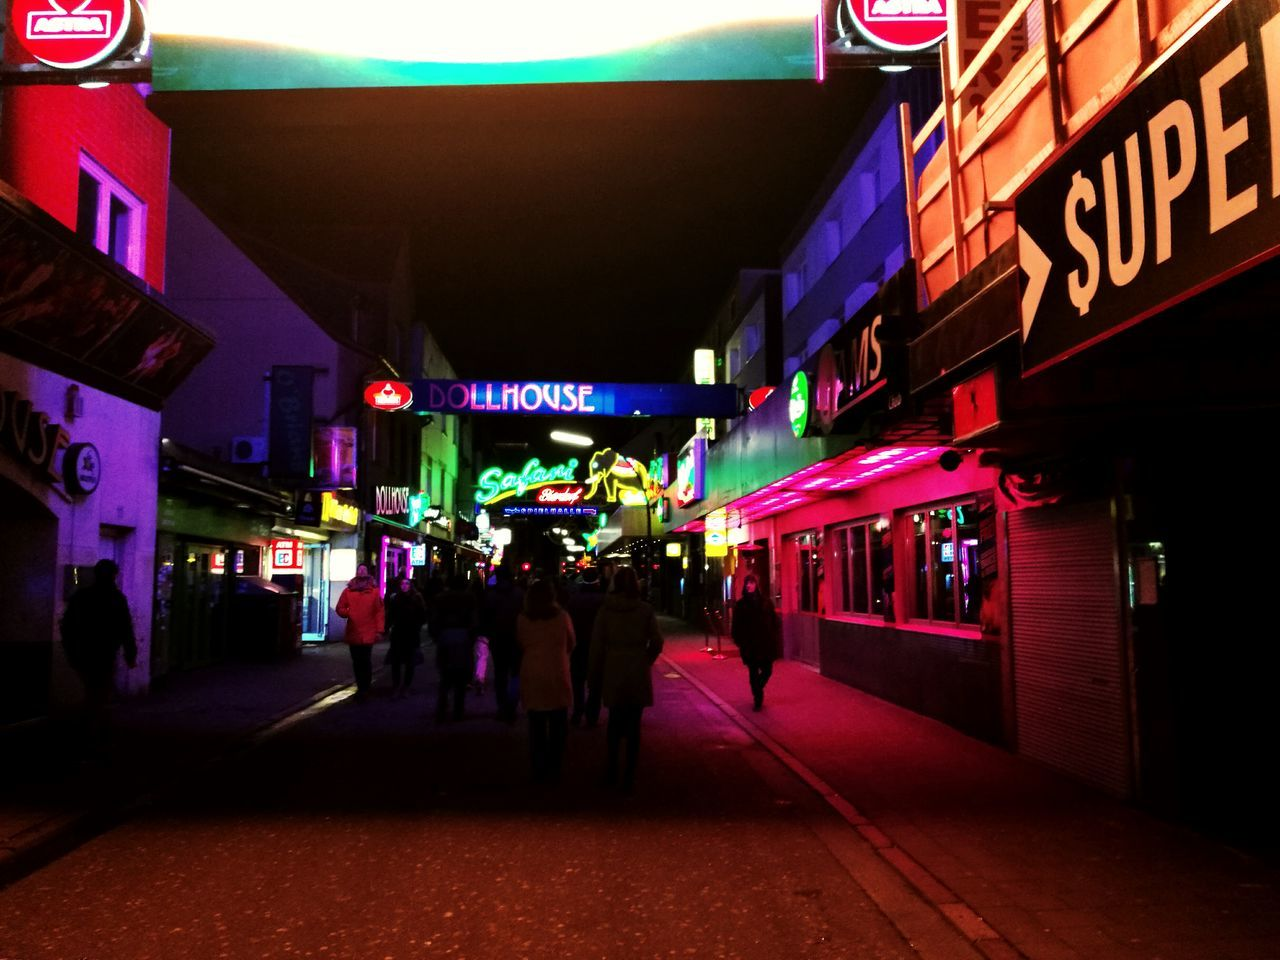 Night Architecture City City Life Adult Nightlife Neon Colored Hamburg Reeperbahn